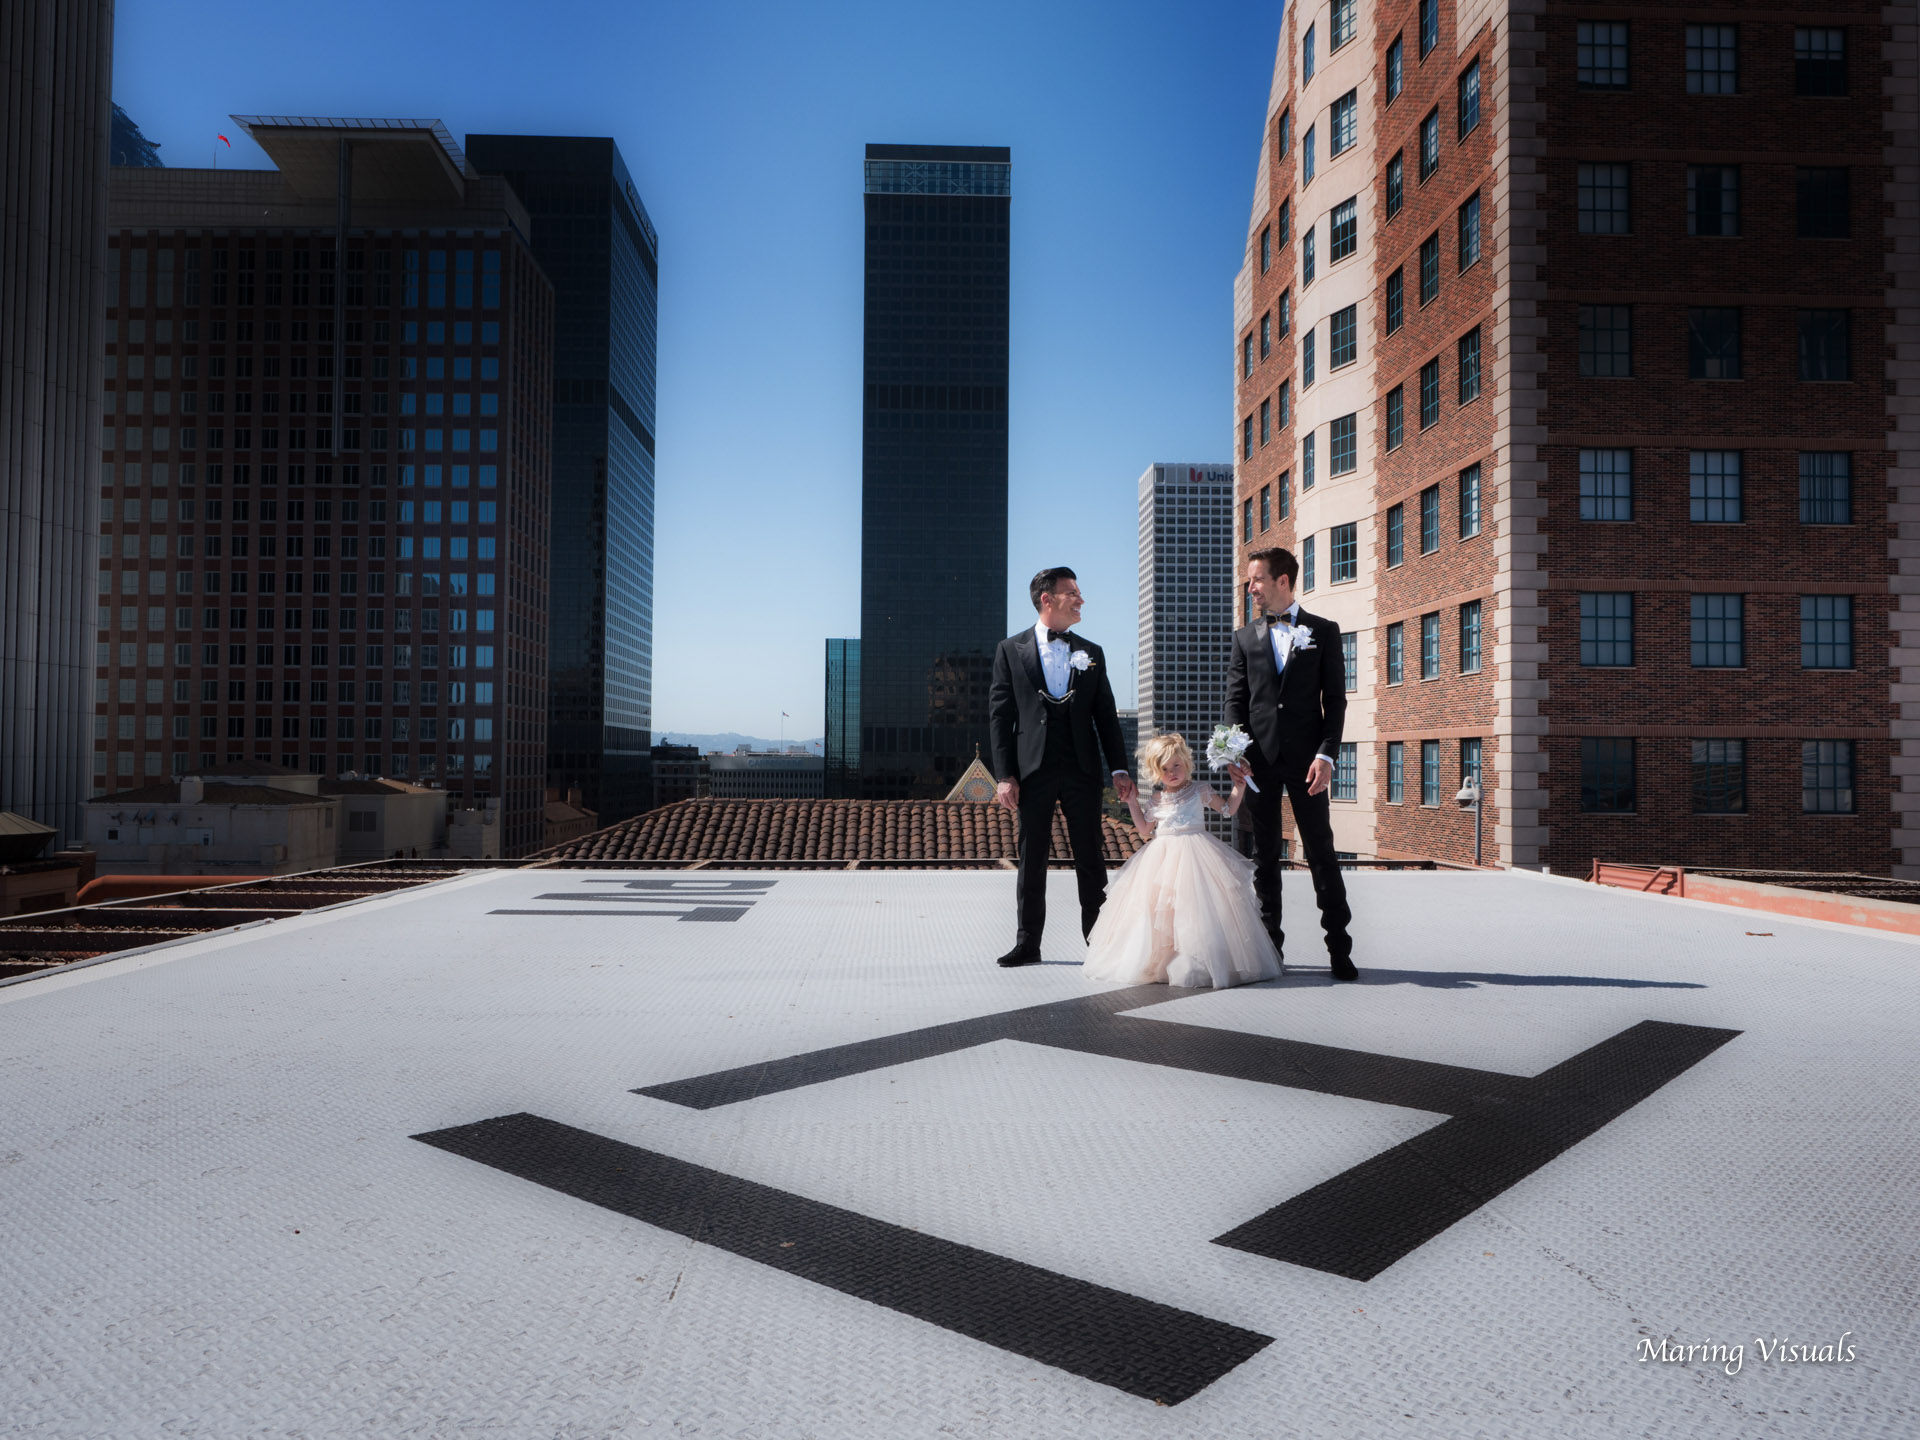 David Tutera Weddings by Maring Visuals 00508.jpg